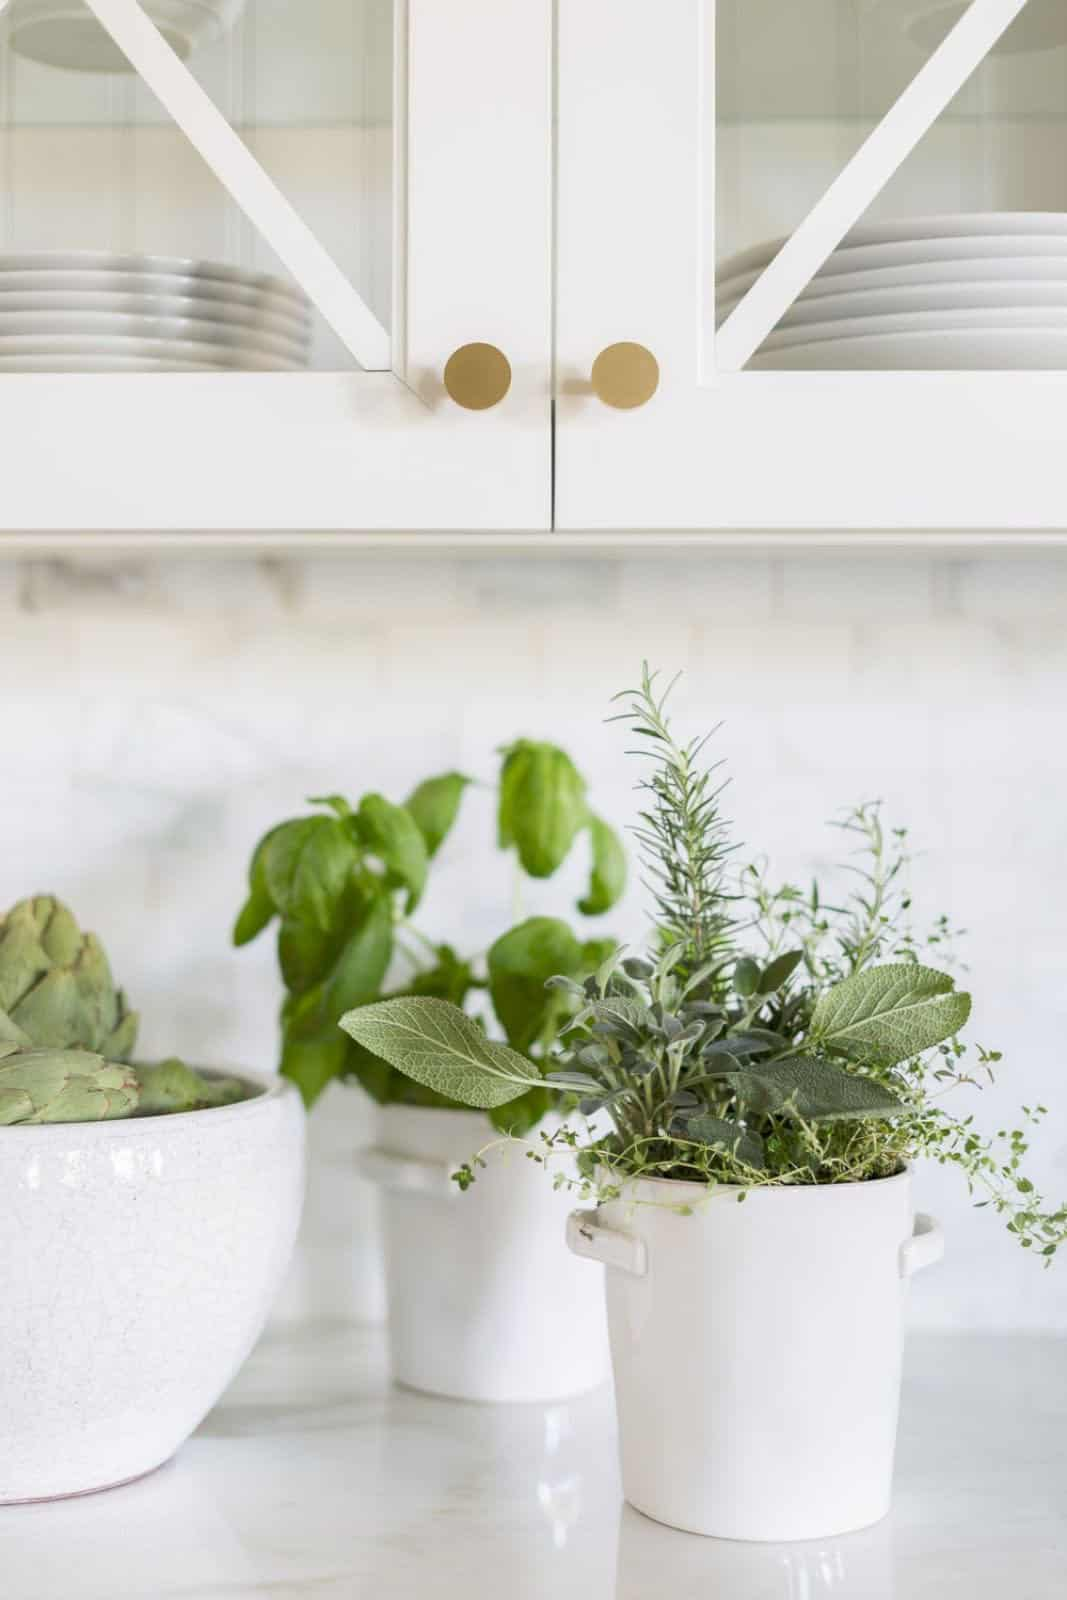 mediterranean-inspired-kitchen-countertop-detail-with-plants